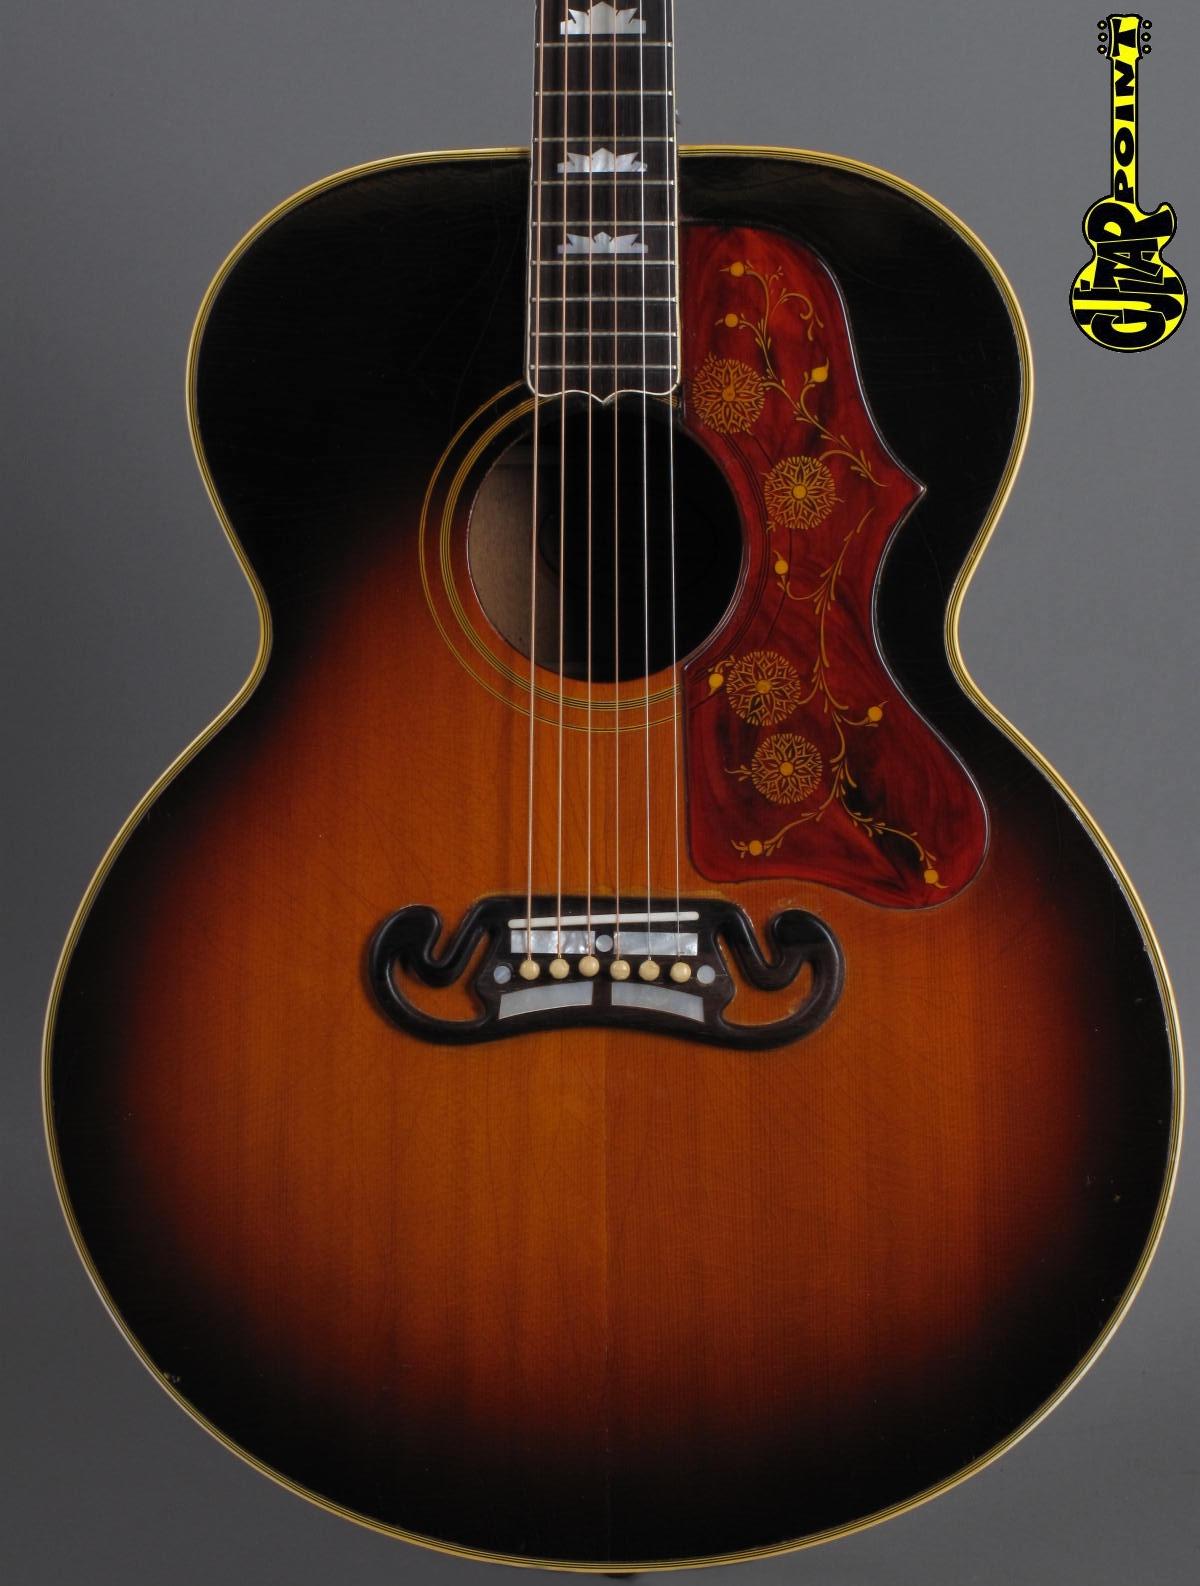 1959 Gibson J-200 - Sunburst